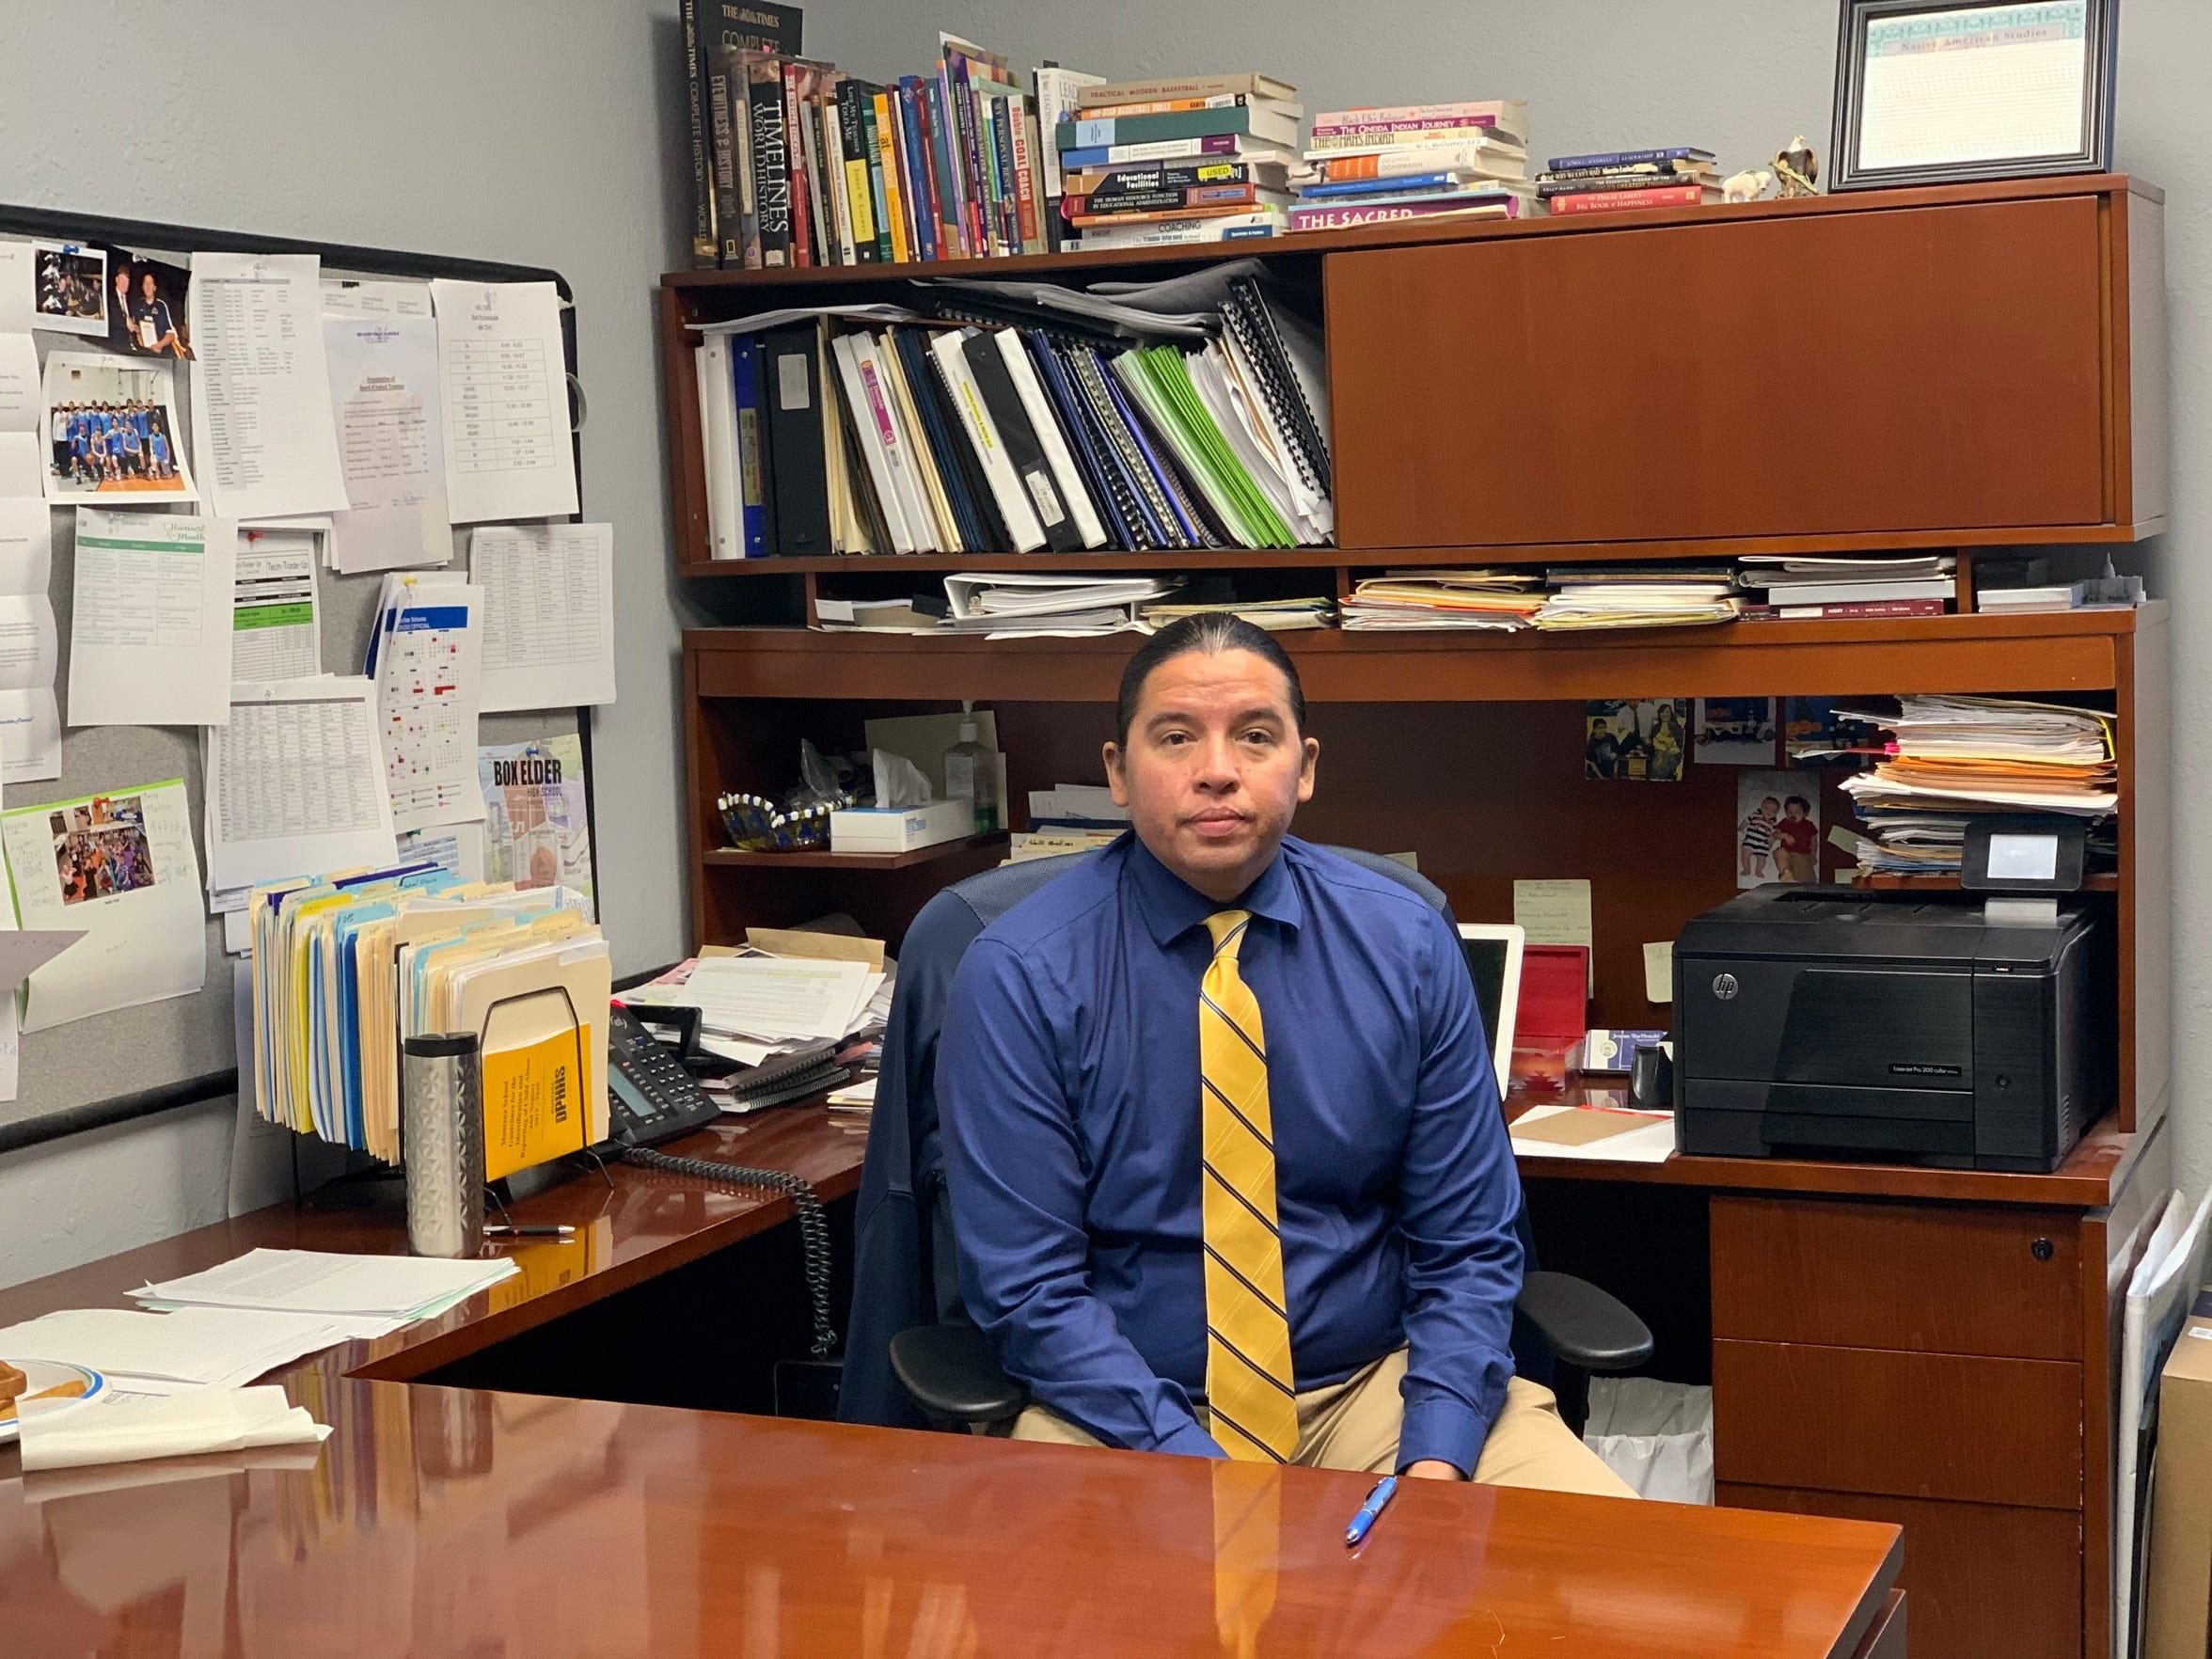 Superintendent of Box Elder School Jeremy MacDonald sits at his desk.